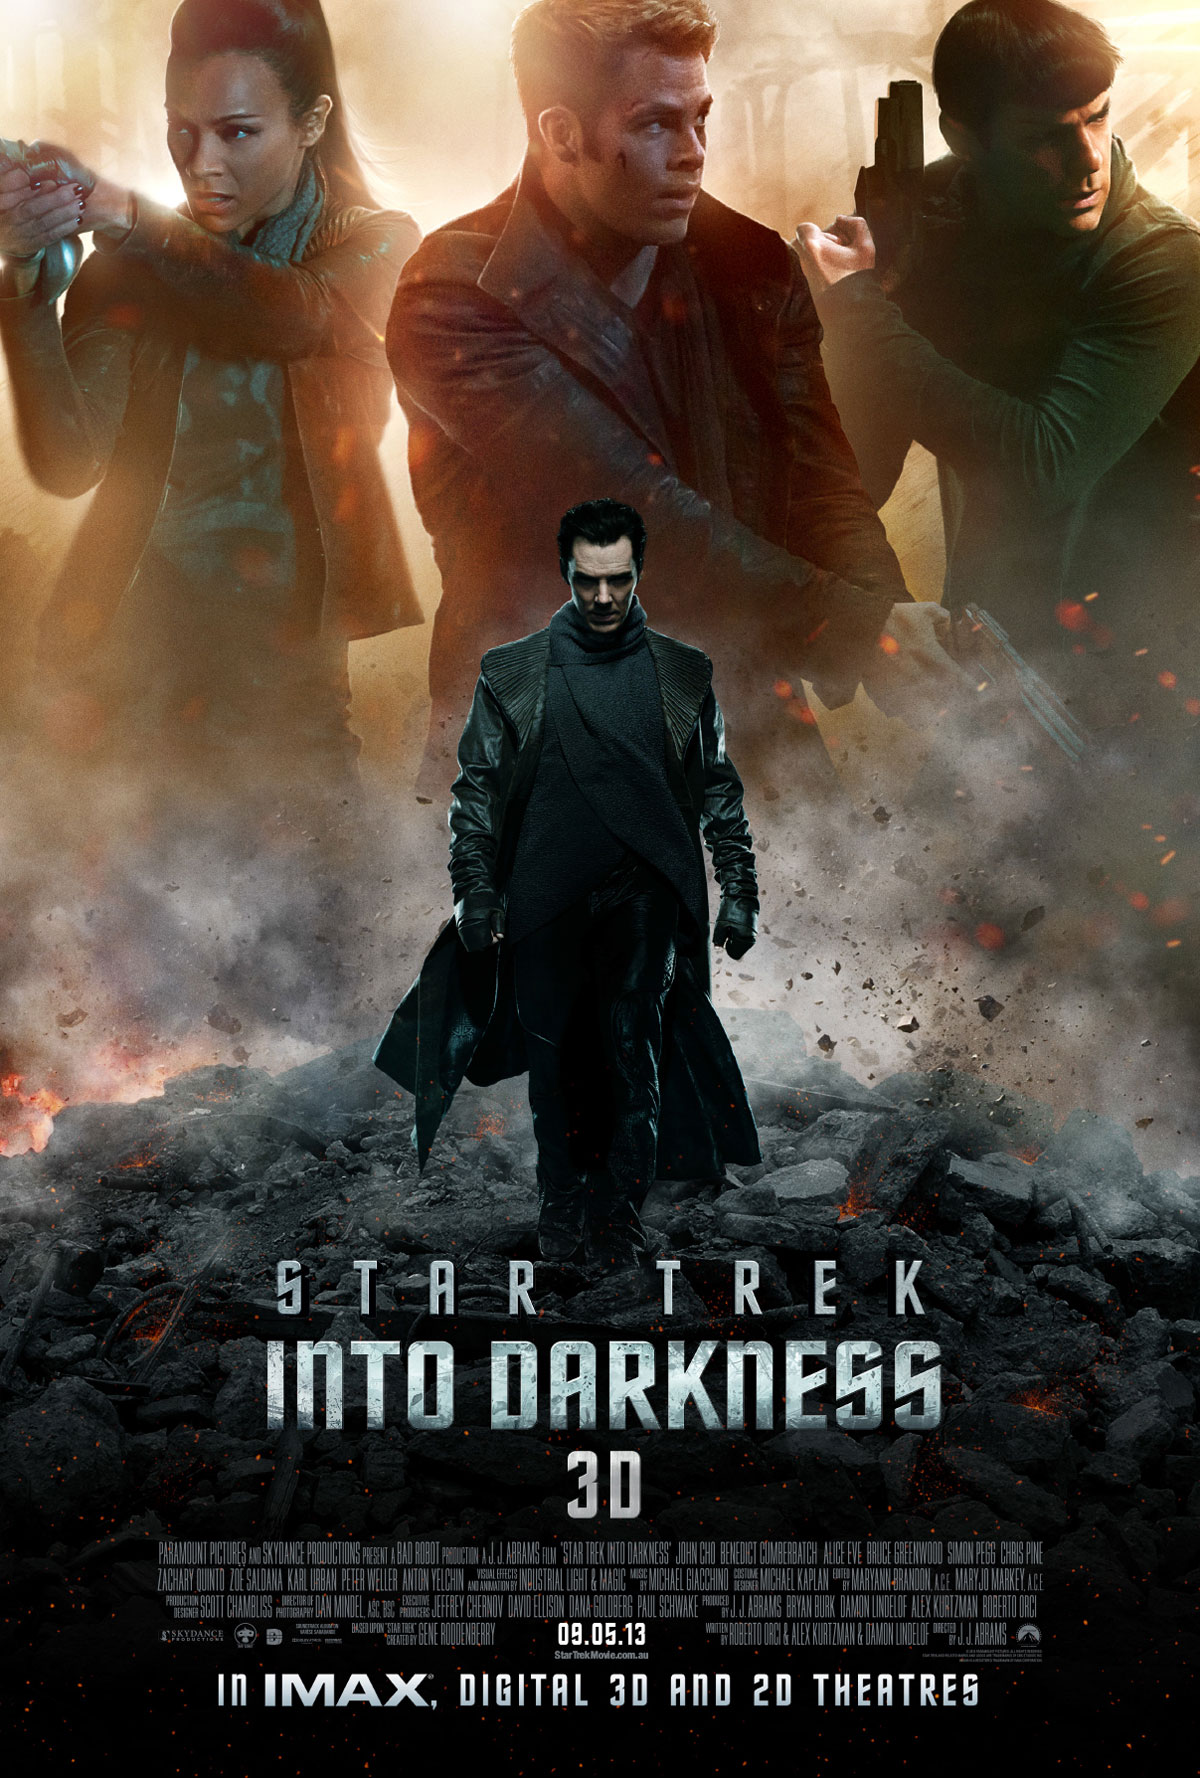 star-trek-2-into-darkness-poster.jpg